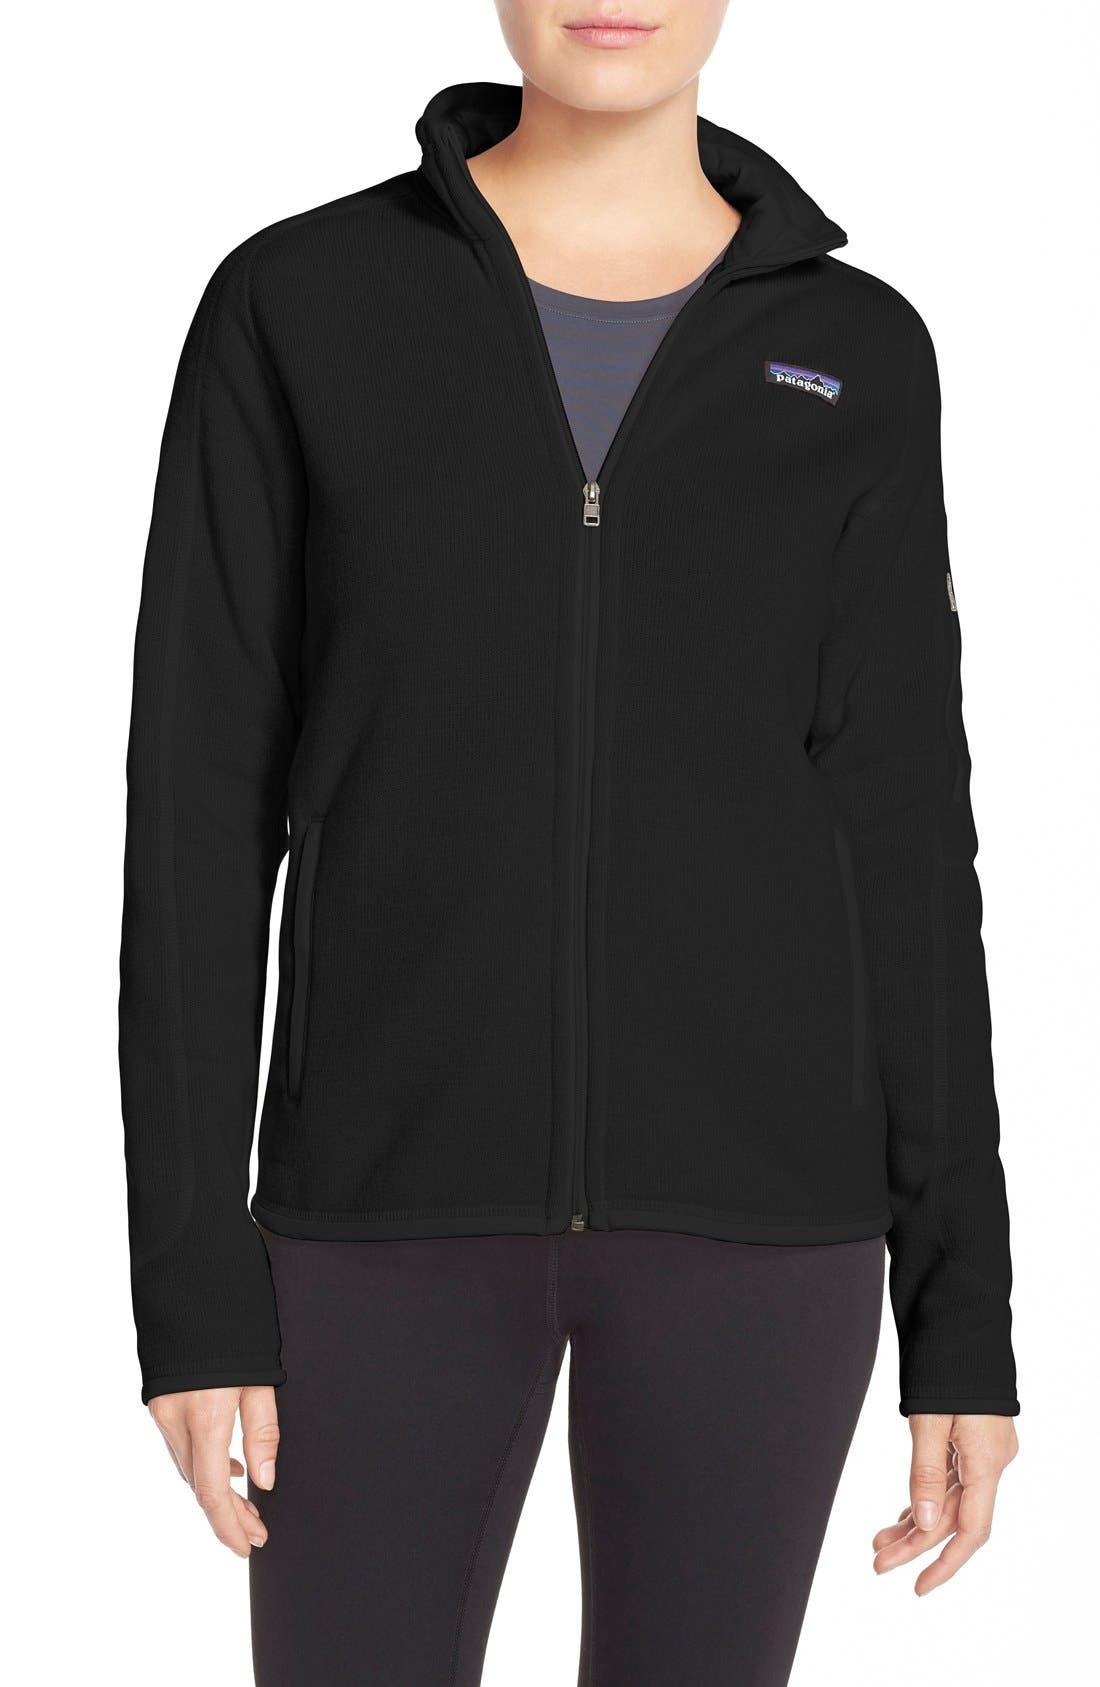 PATAGONIA, 'BetterSweater' Jacket, Main thumbnail 1, color, BLACK